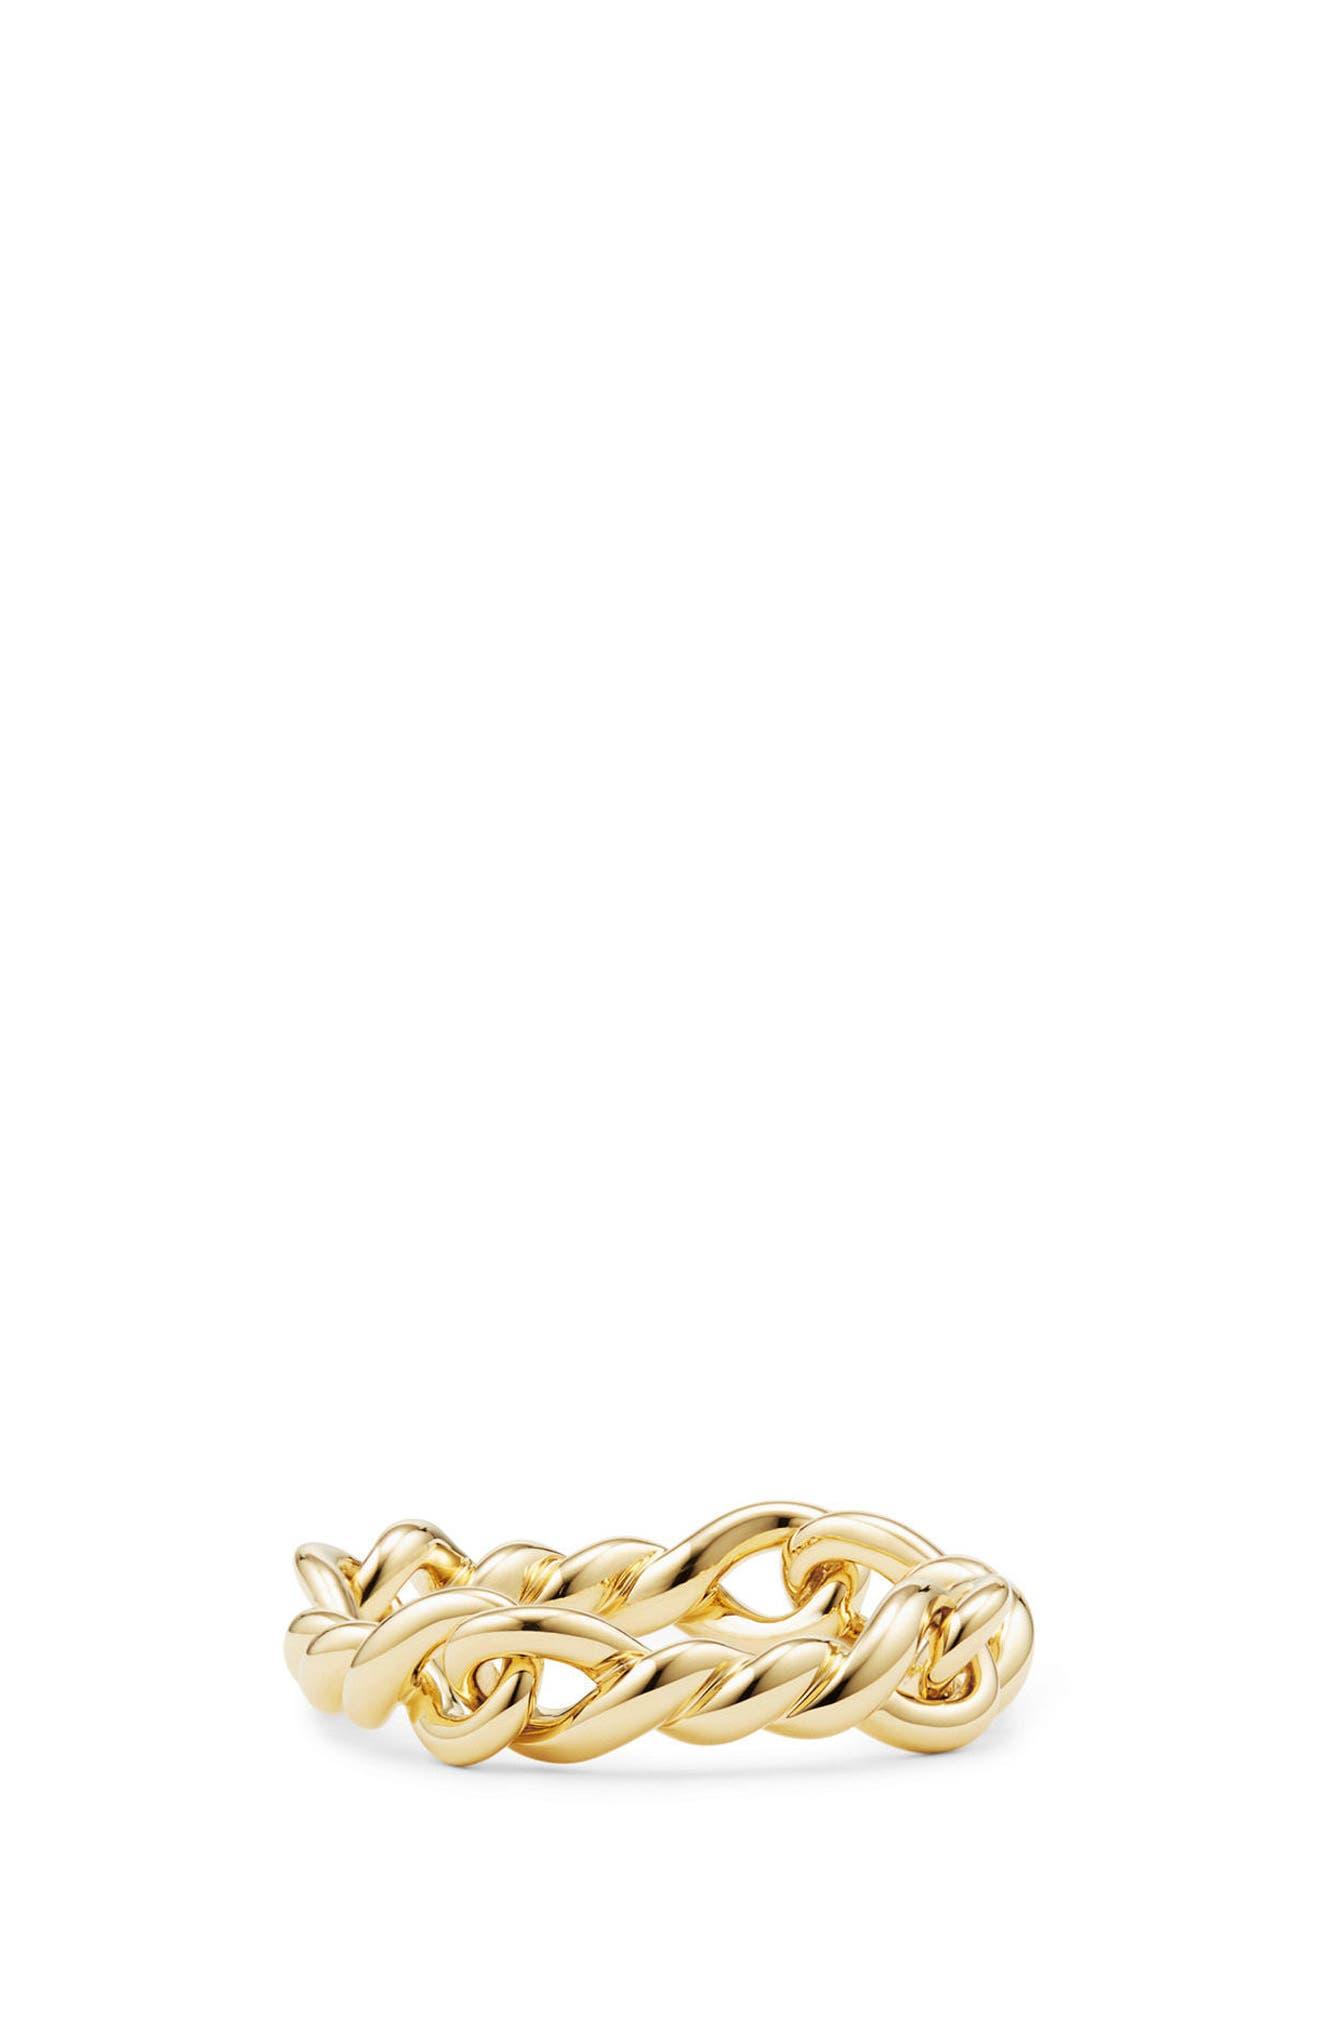 DAVID YURMAN,                             Continuance Ring in 18K Gold,                             Main thumbnail 1, color,                             YELLOW GOLD